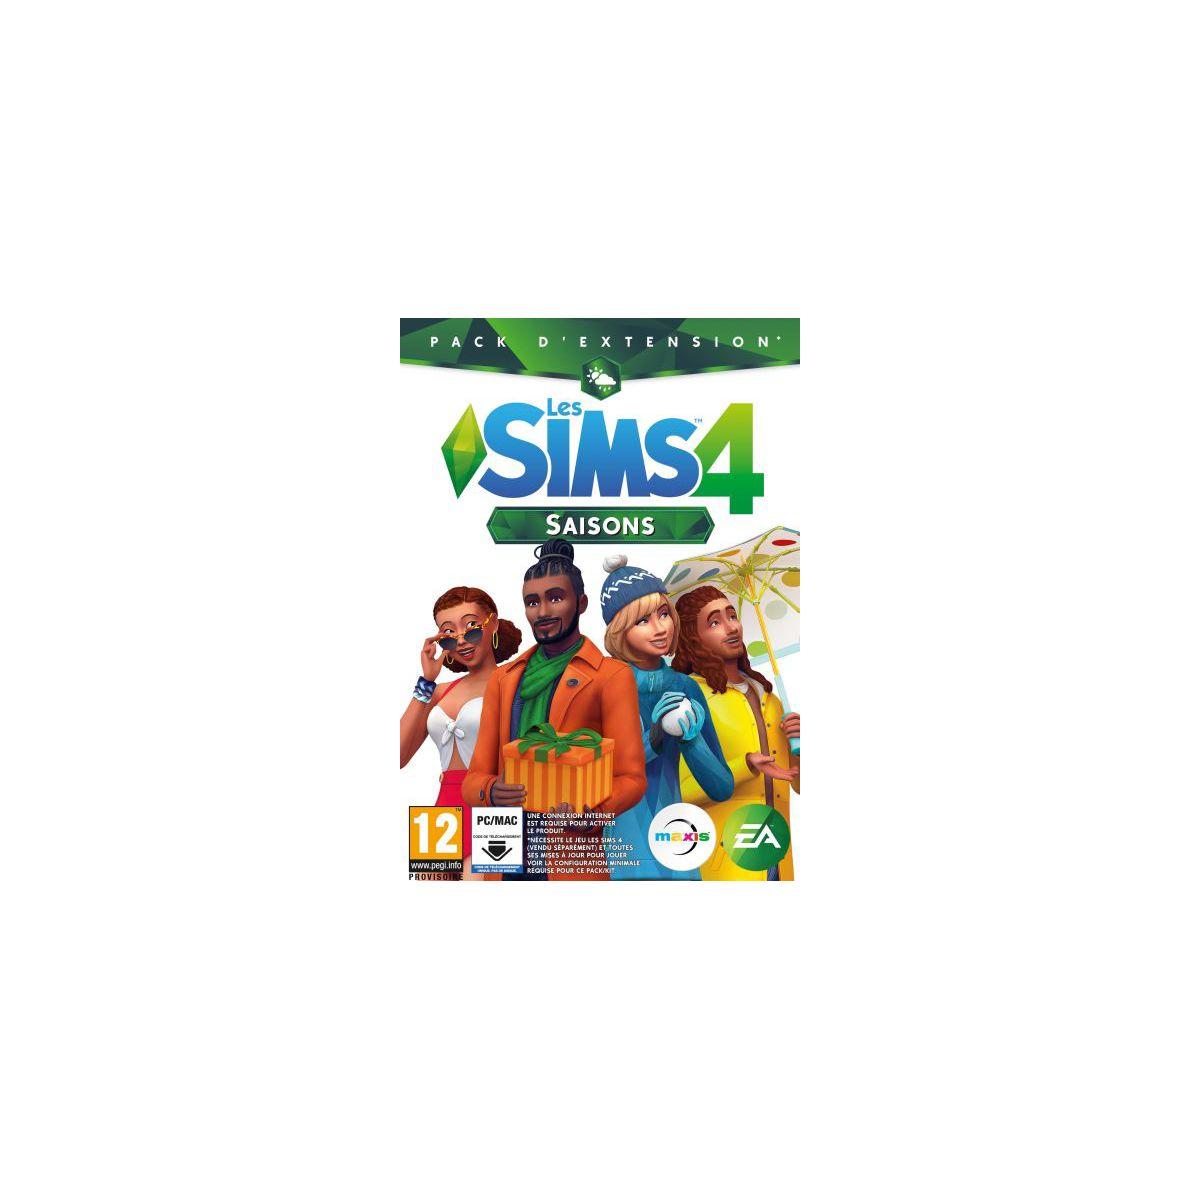 Jeu PC ELECTRONIC ARTS Les Sims 4 Saisons (photo)